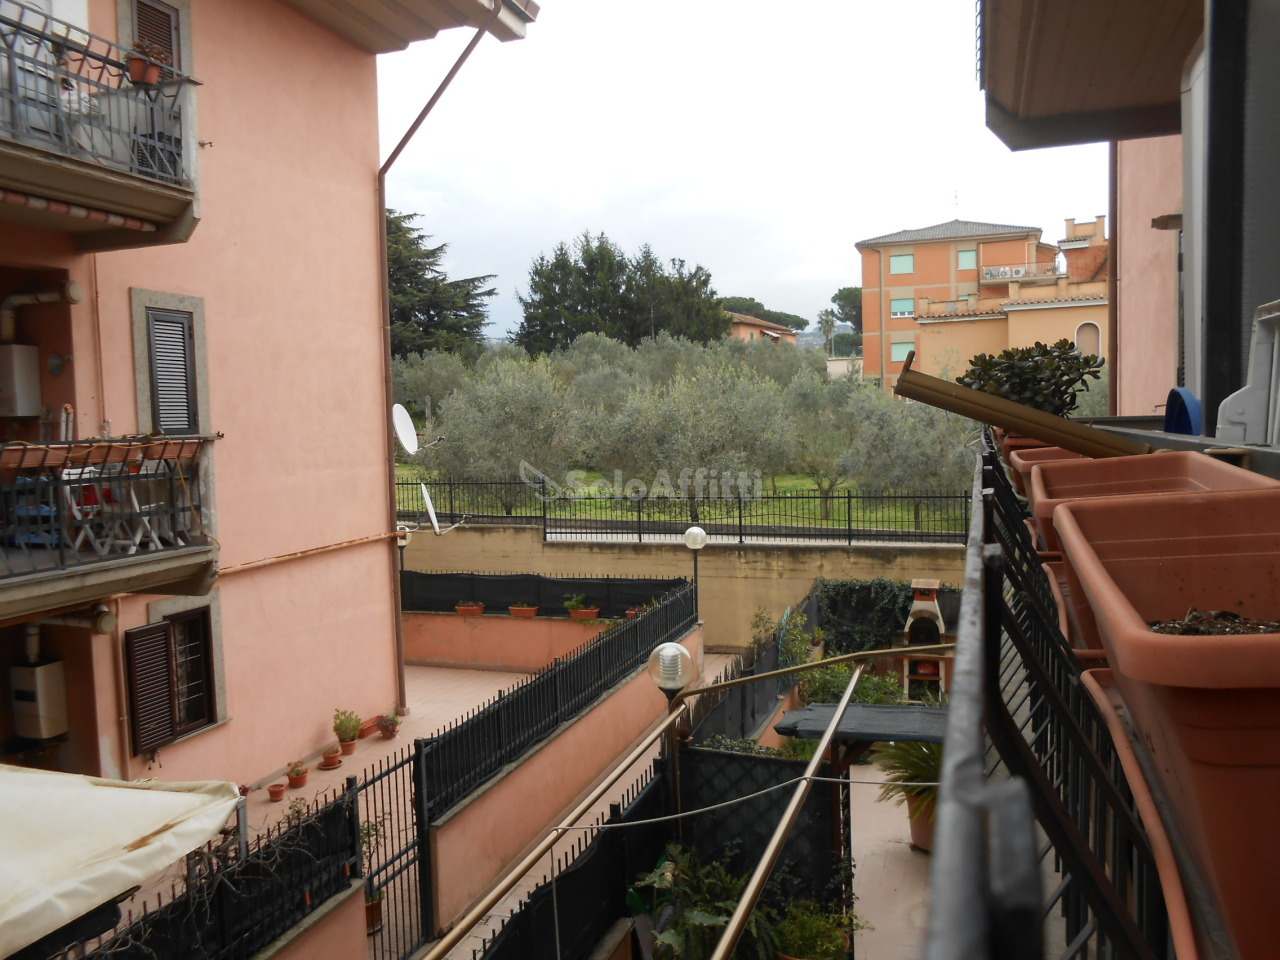 Bilocale Marino Via Nettunense Vecchia 1 12